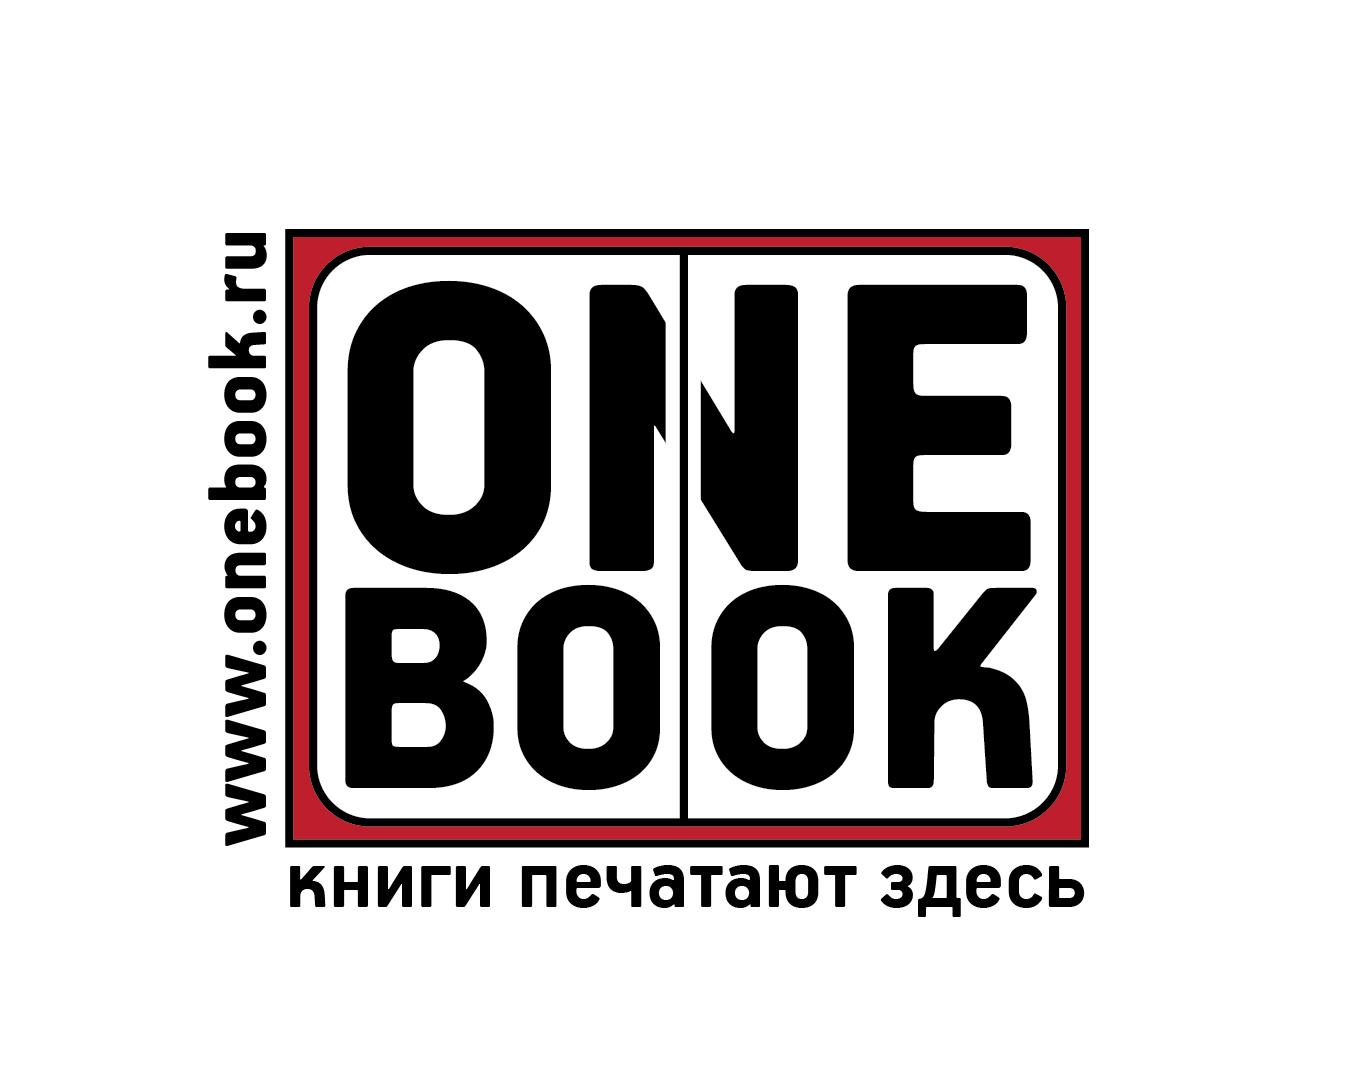 Логотип для цифровой книжной типографии. фото f_4cbc4c2d3bb67.jpg